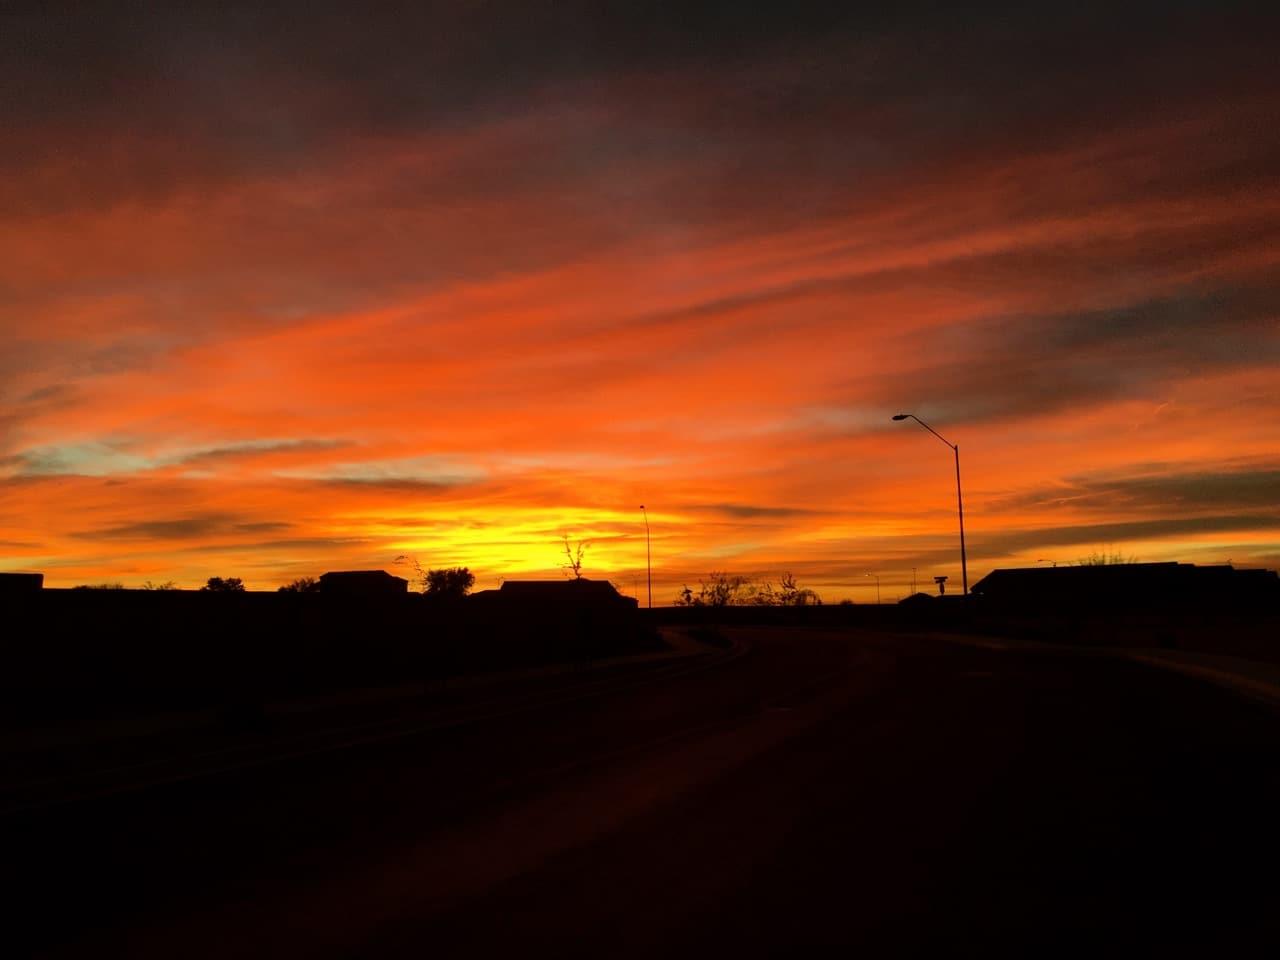 Sunset in Yuma Arizona on the way to Tucson